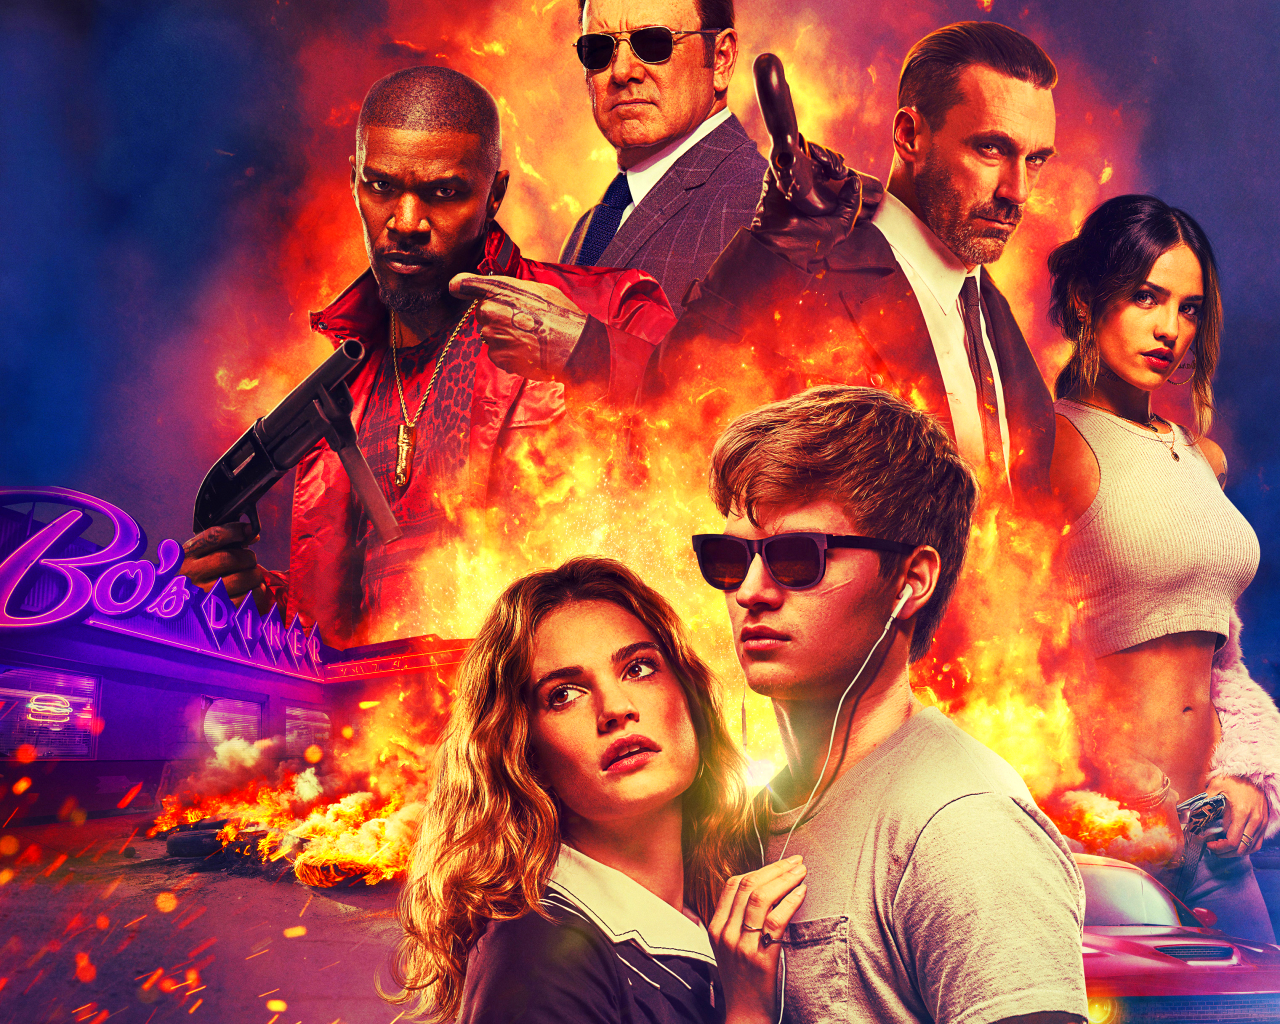 Baby Driver - Movies Wallpaper (40872136) - Fanpop